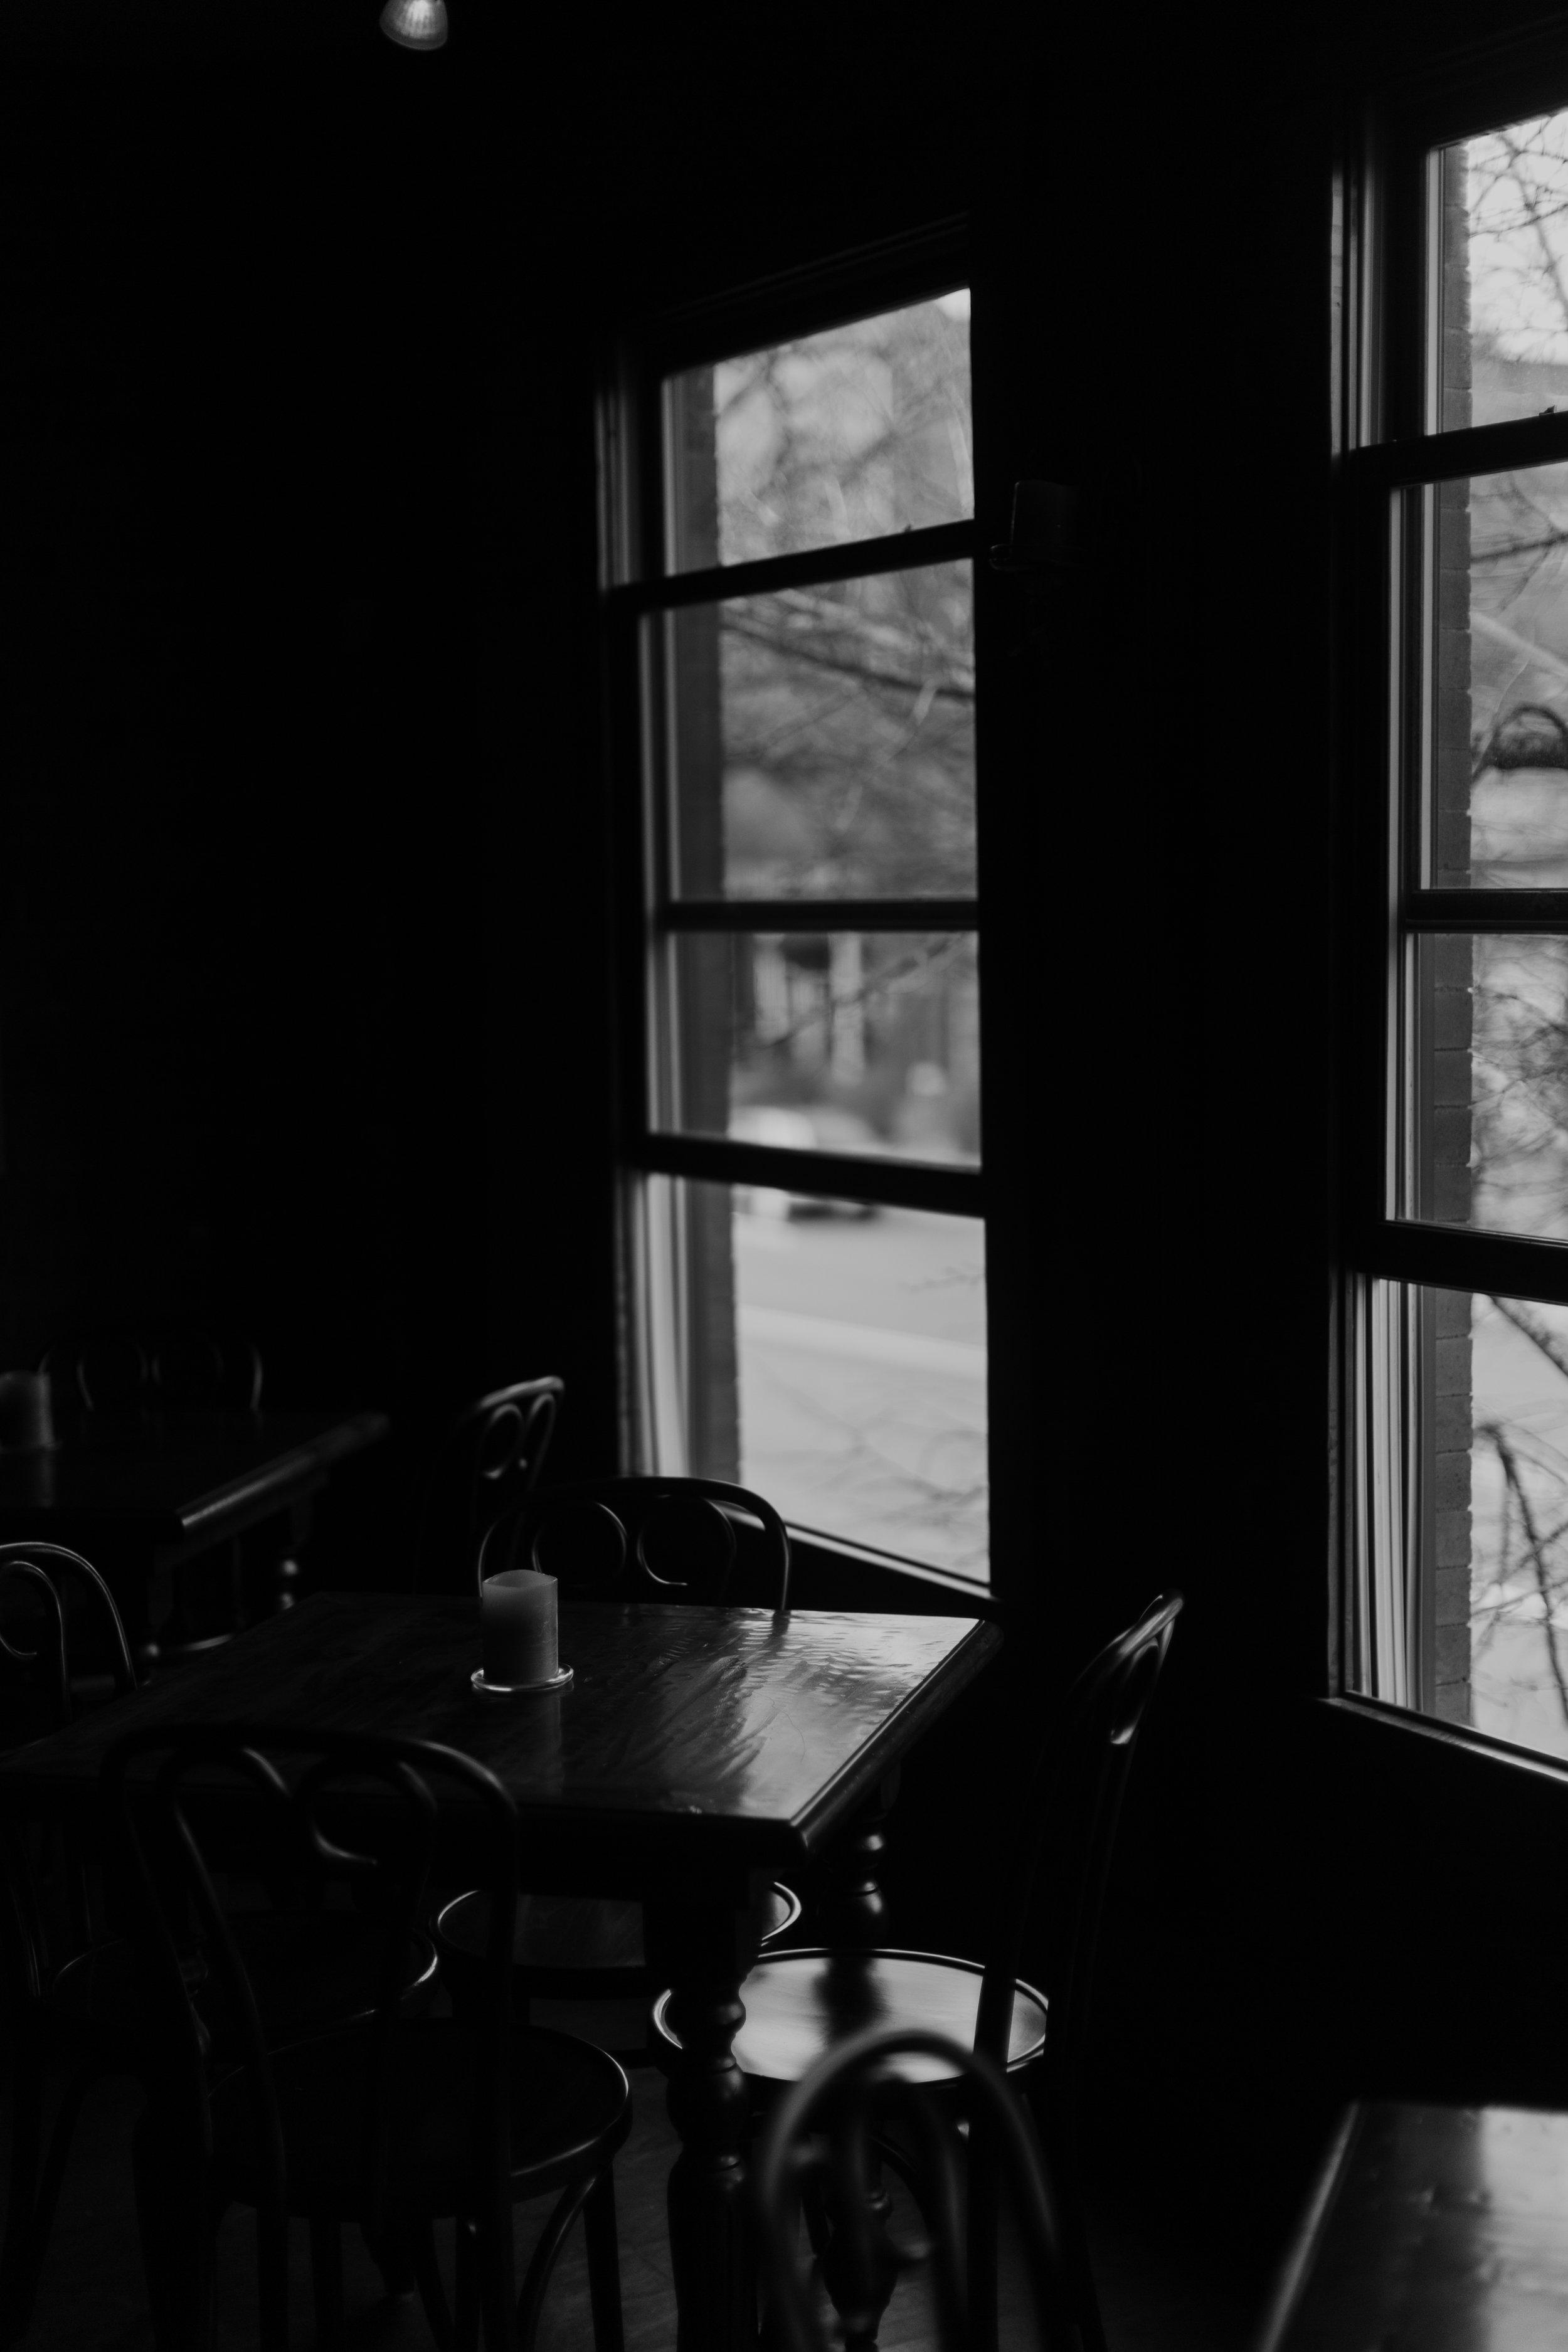 tlb-upstairs-wine-bar-occ-elan-photographie-studio-14.jpg